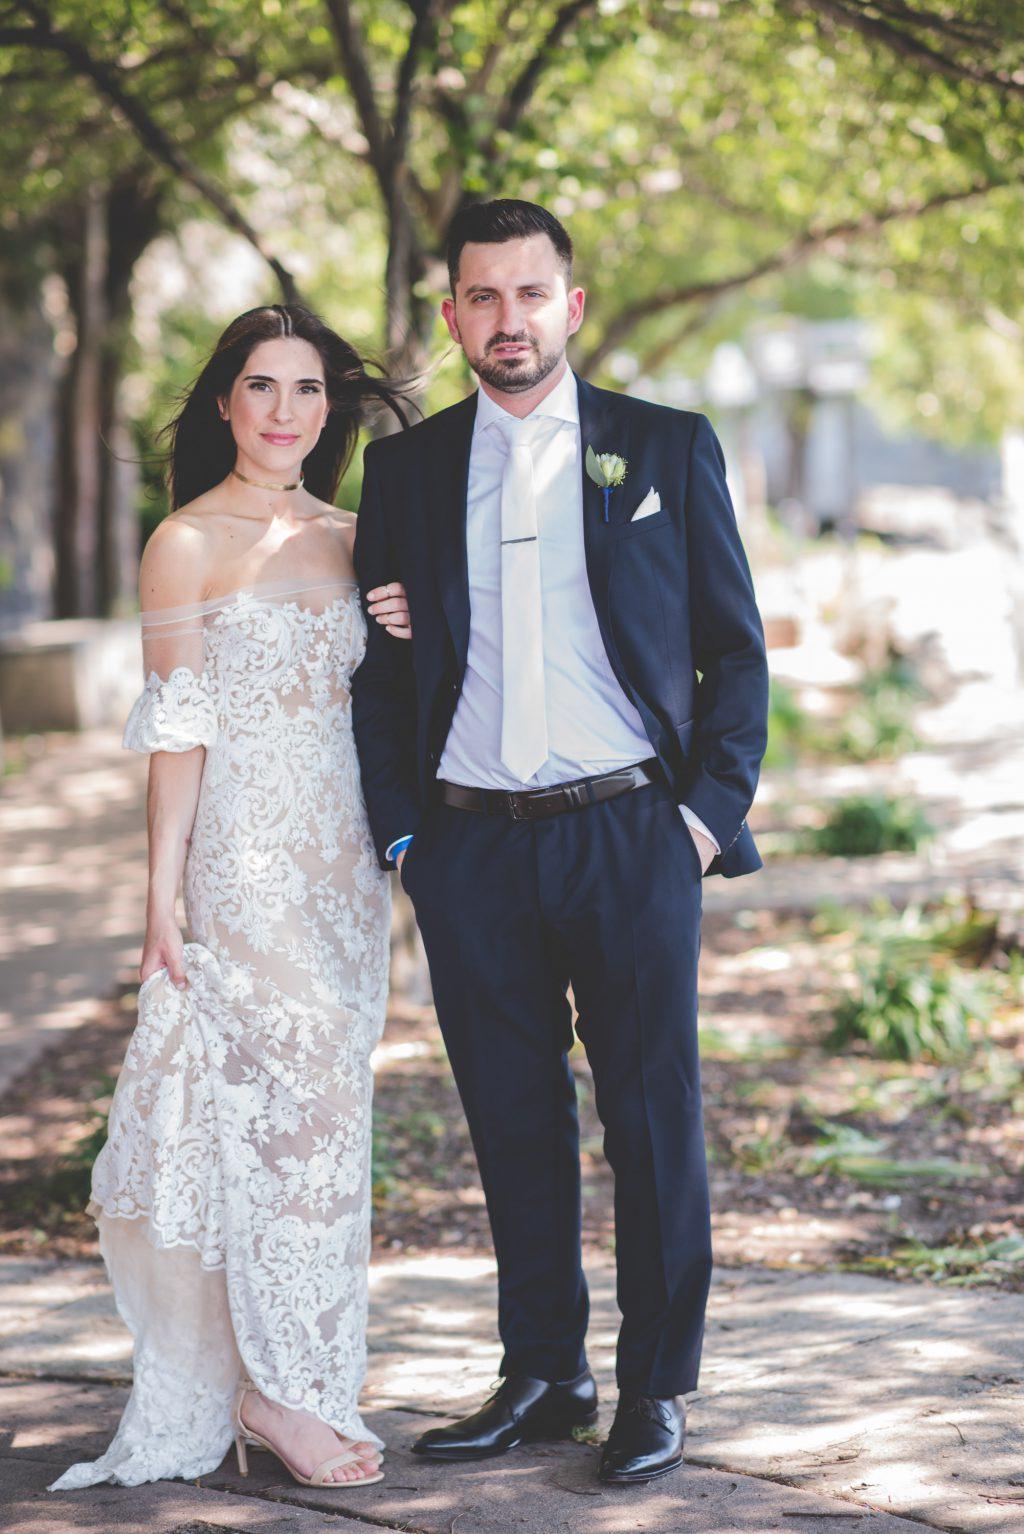 Philadelphia-wedding-Photographer-BG-Productions-142